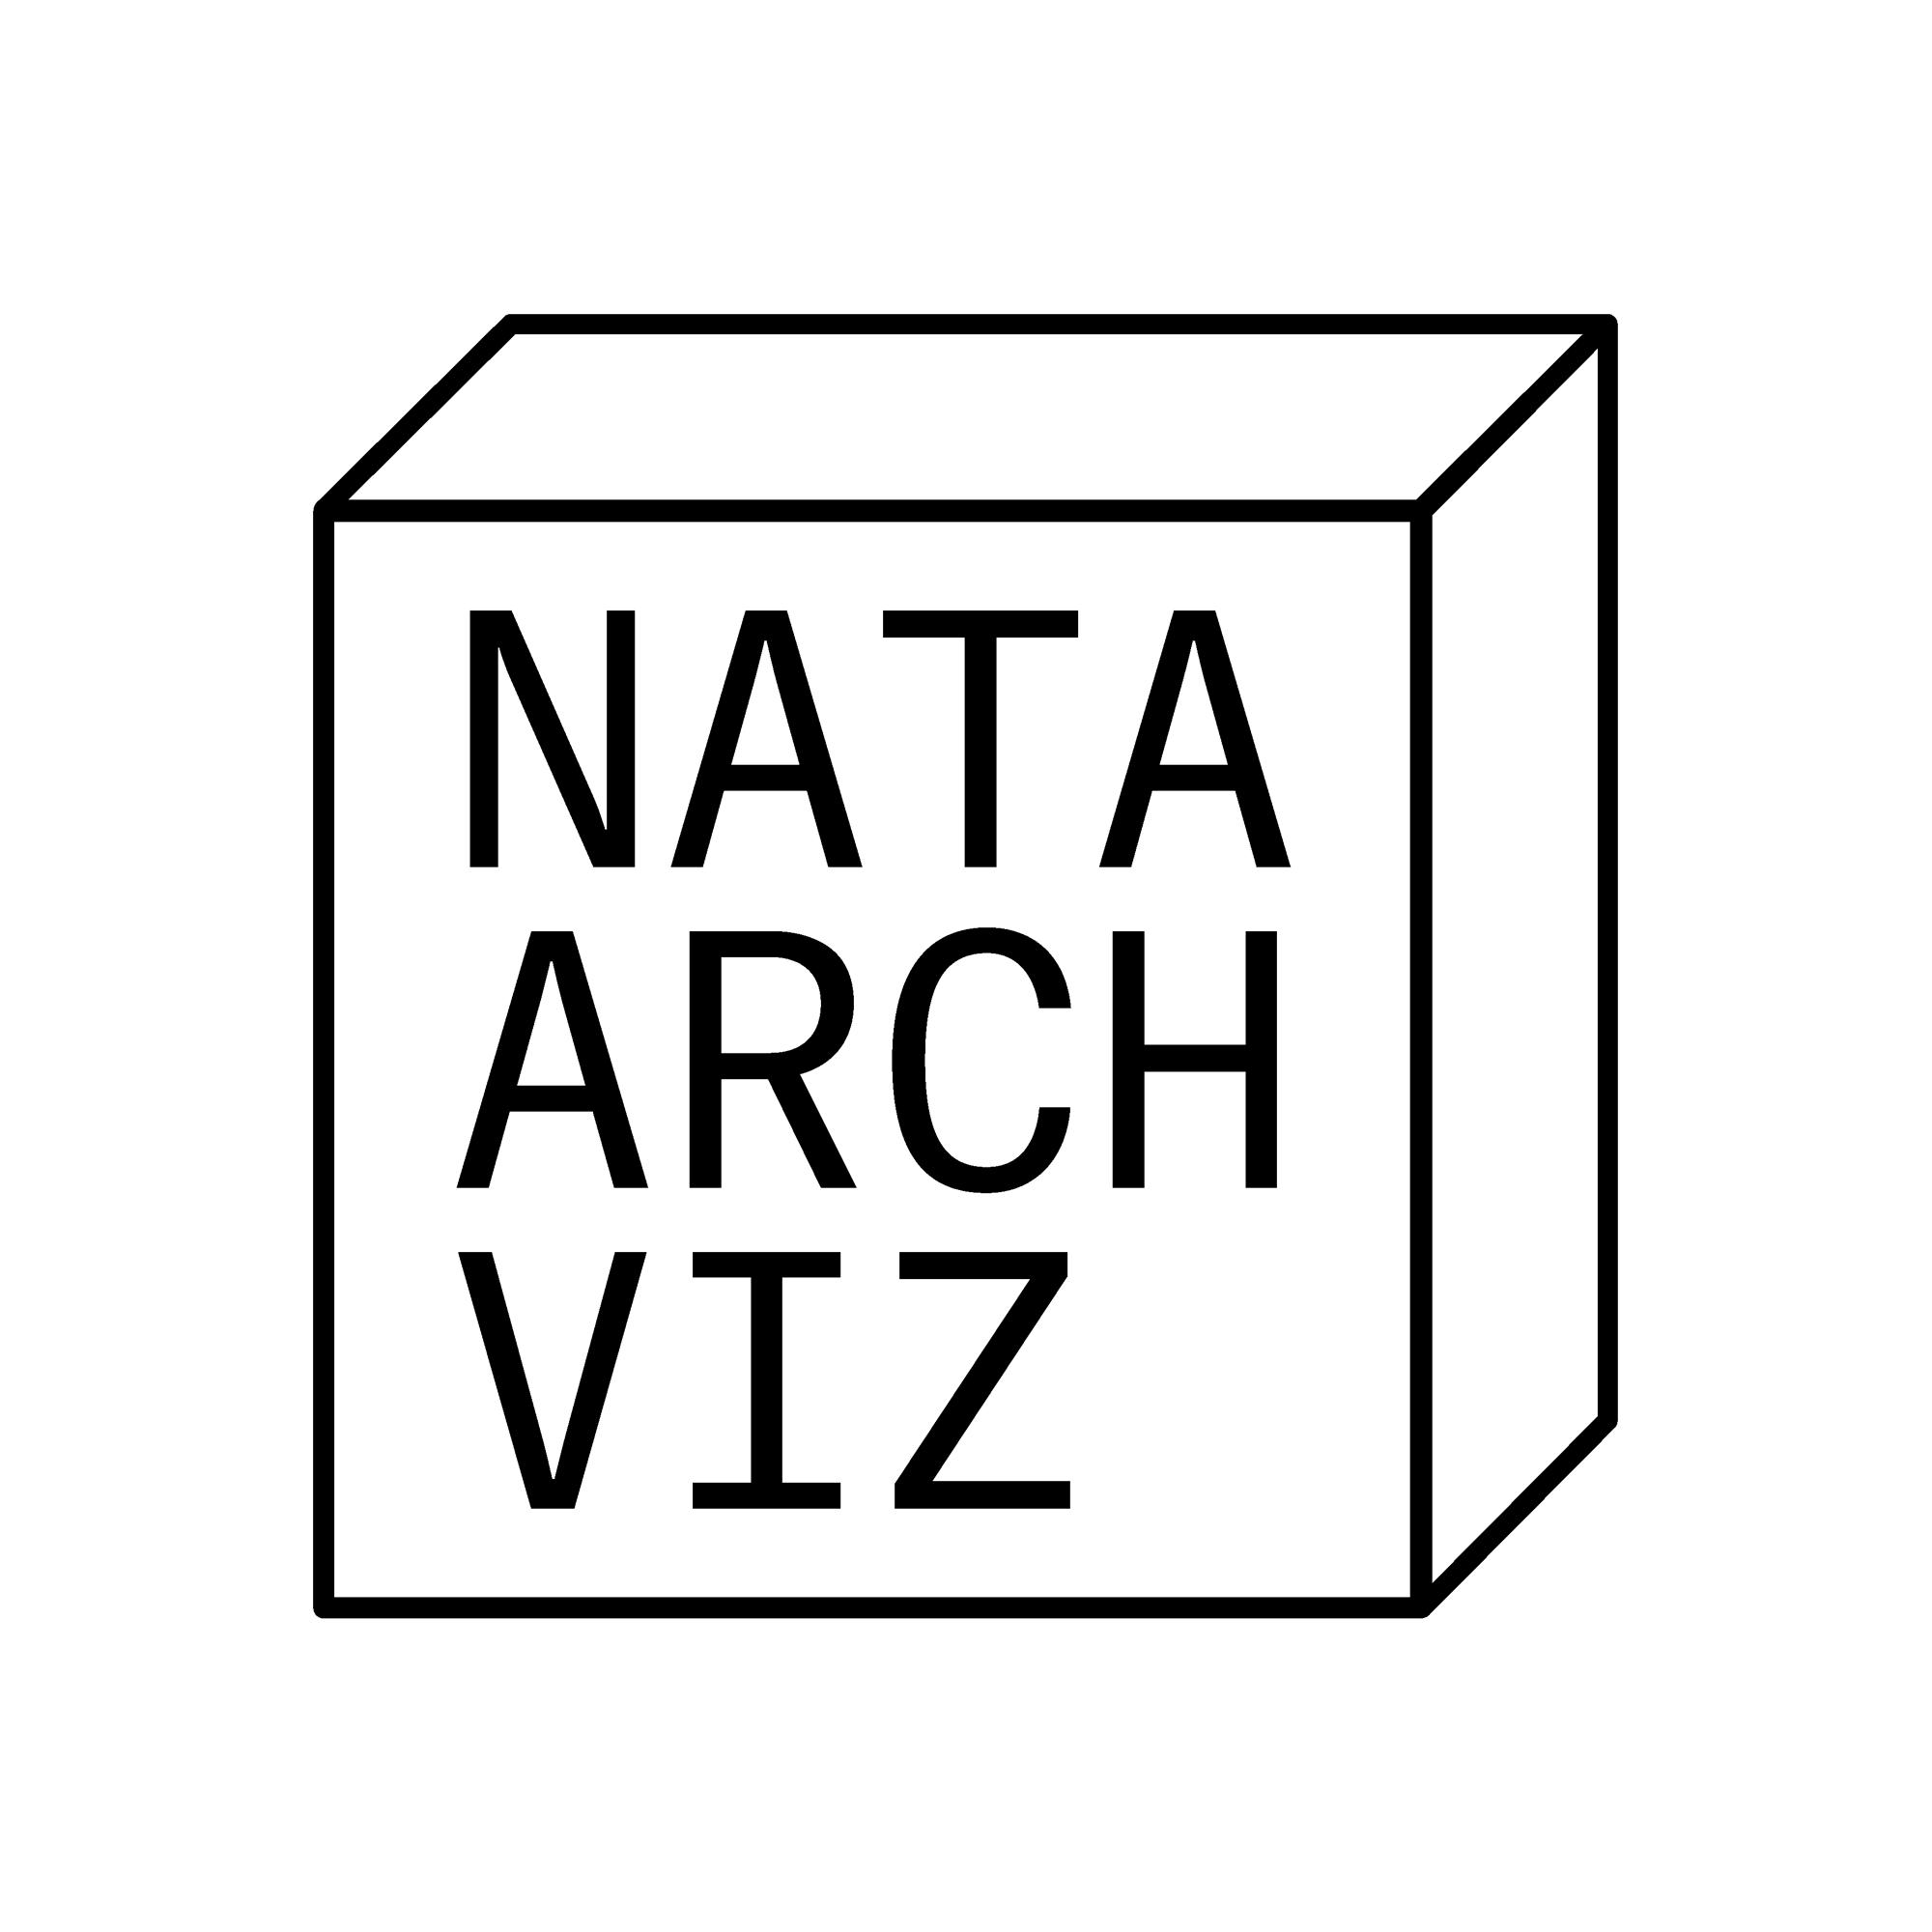 NATA.ARCHVIZ